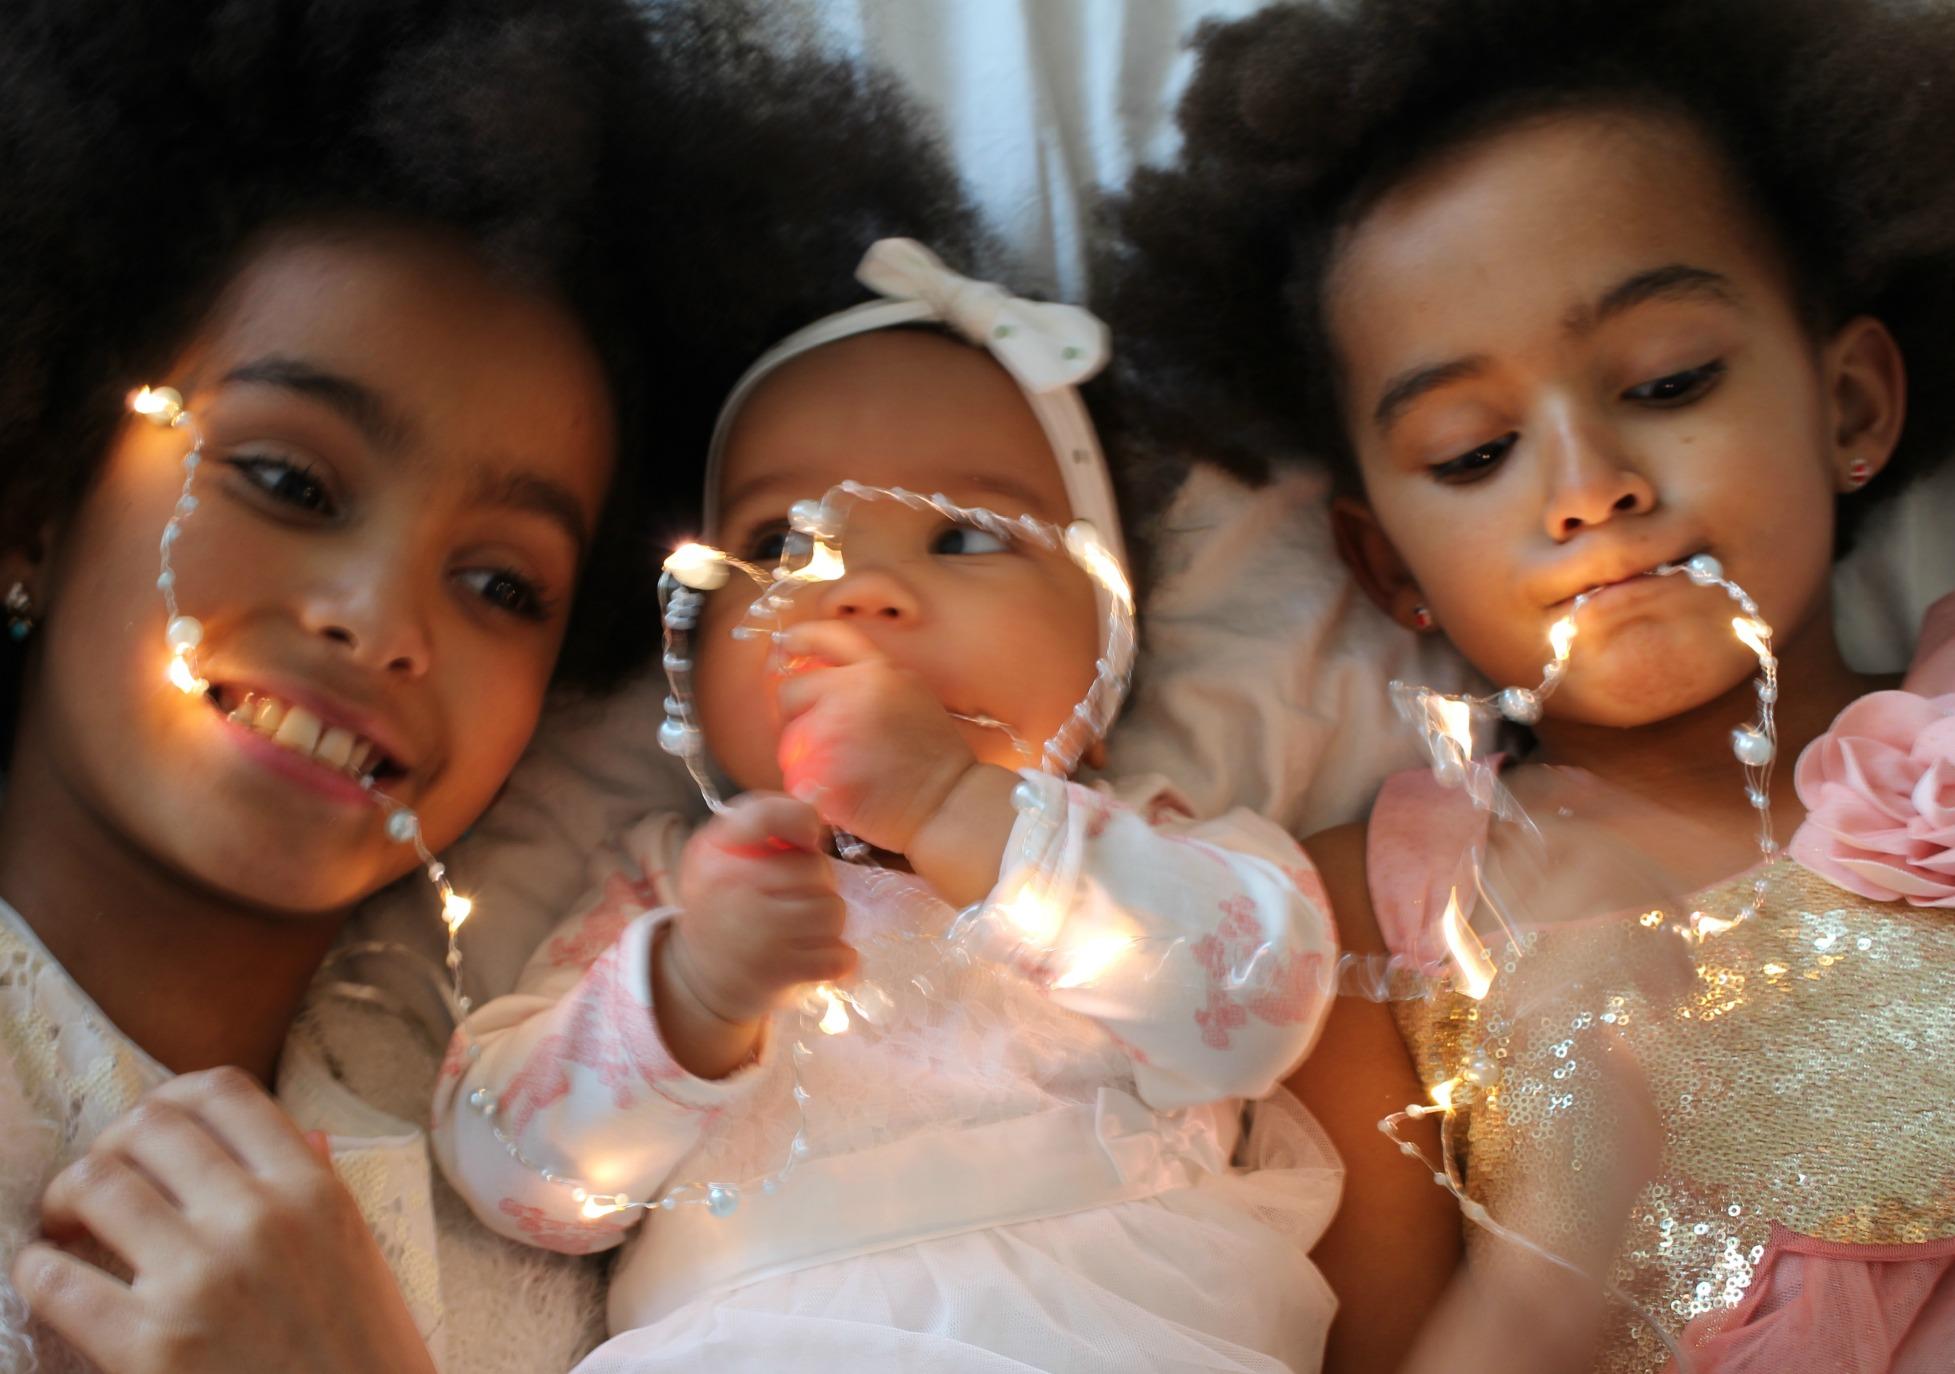 Een ongepland kind is een ongewenst kind-GoodGirslCompany-ongewenst zwanger